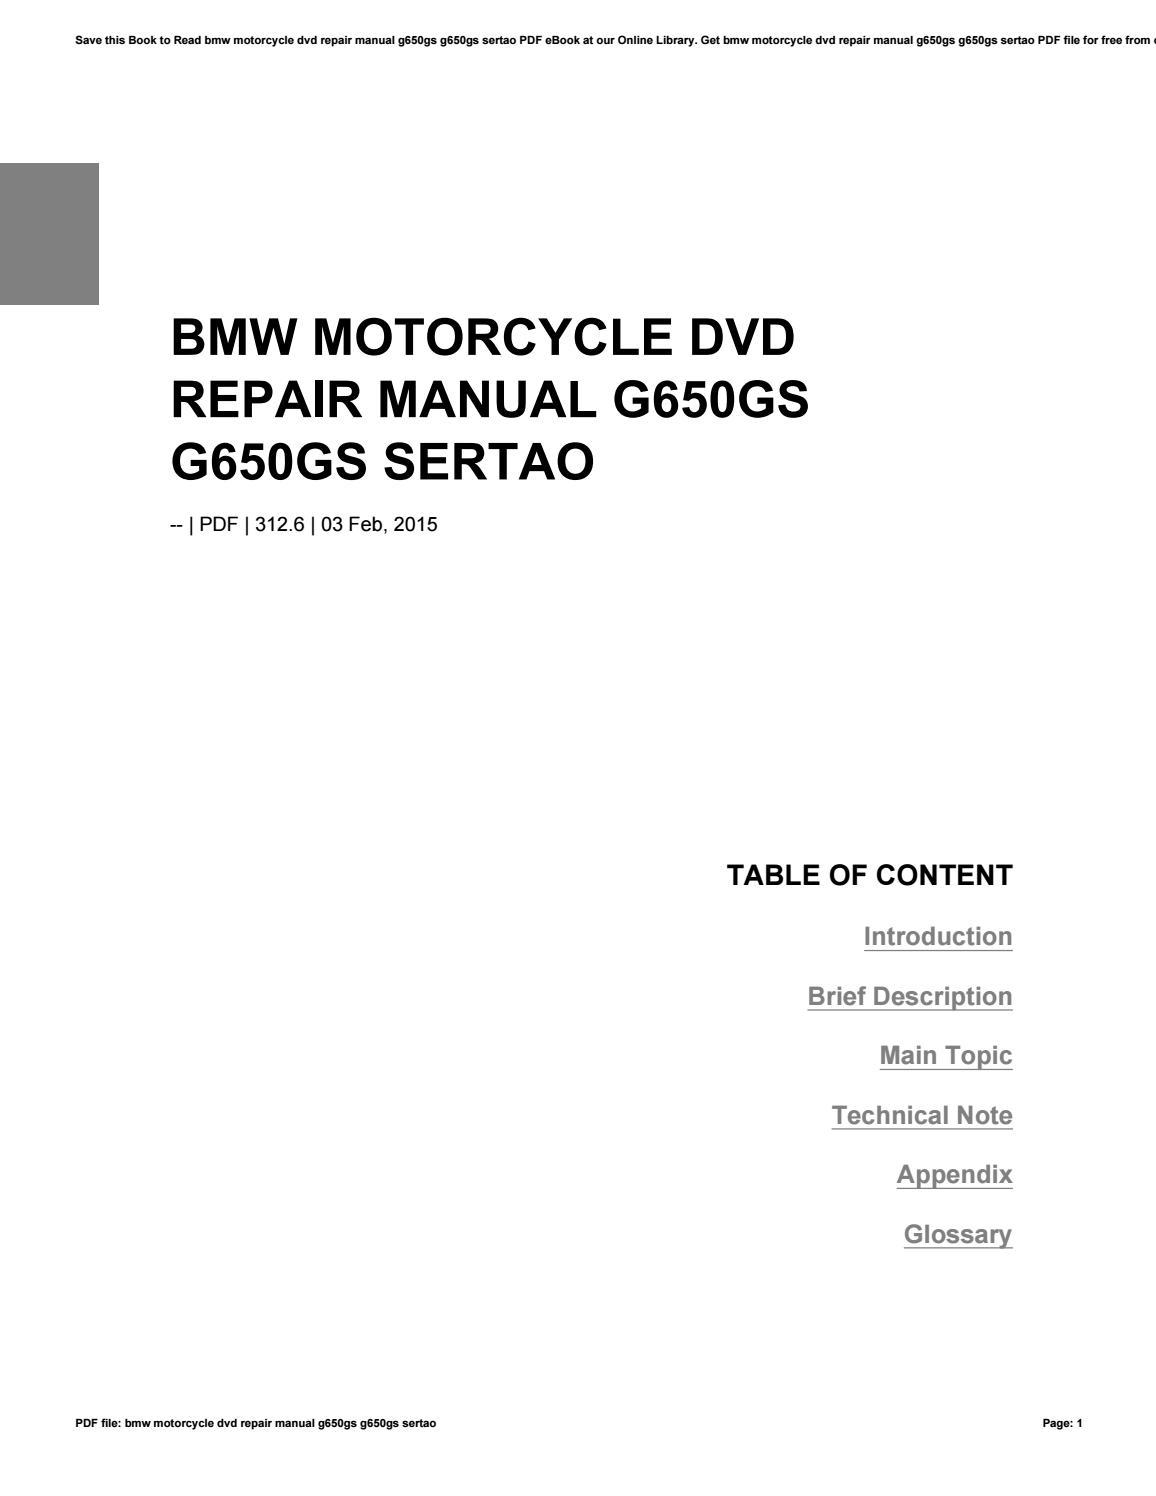 Bmw Motorcycle Dvd Repair Manual G650gs G650gs Sertao By Preseven66 Issuu